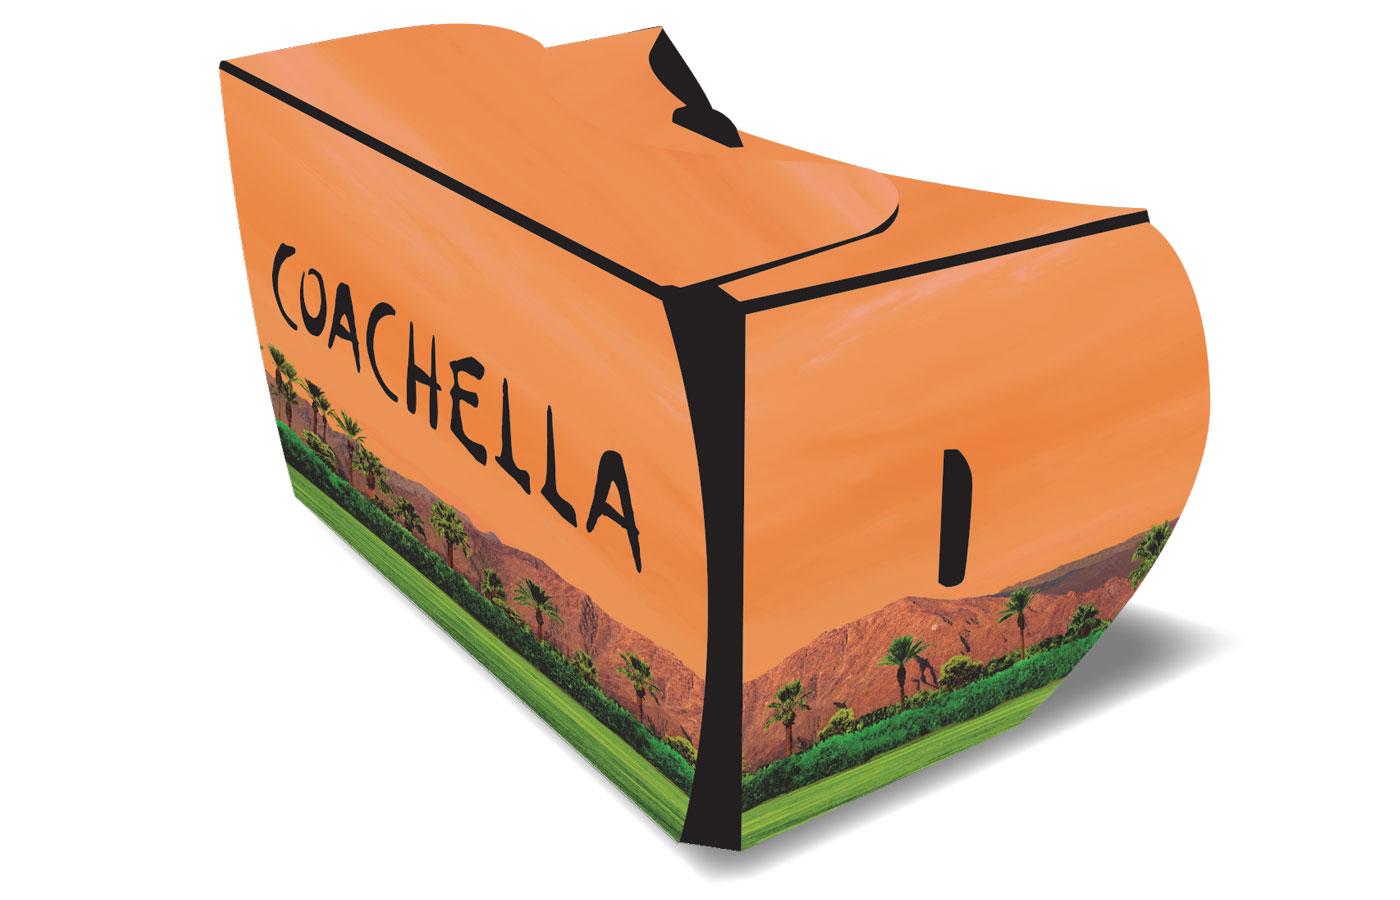 Coachella Prepares Festival-goers with Google Cardboard